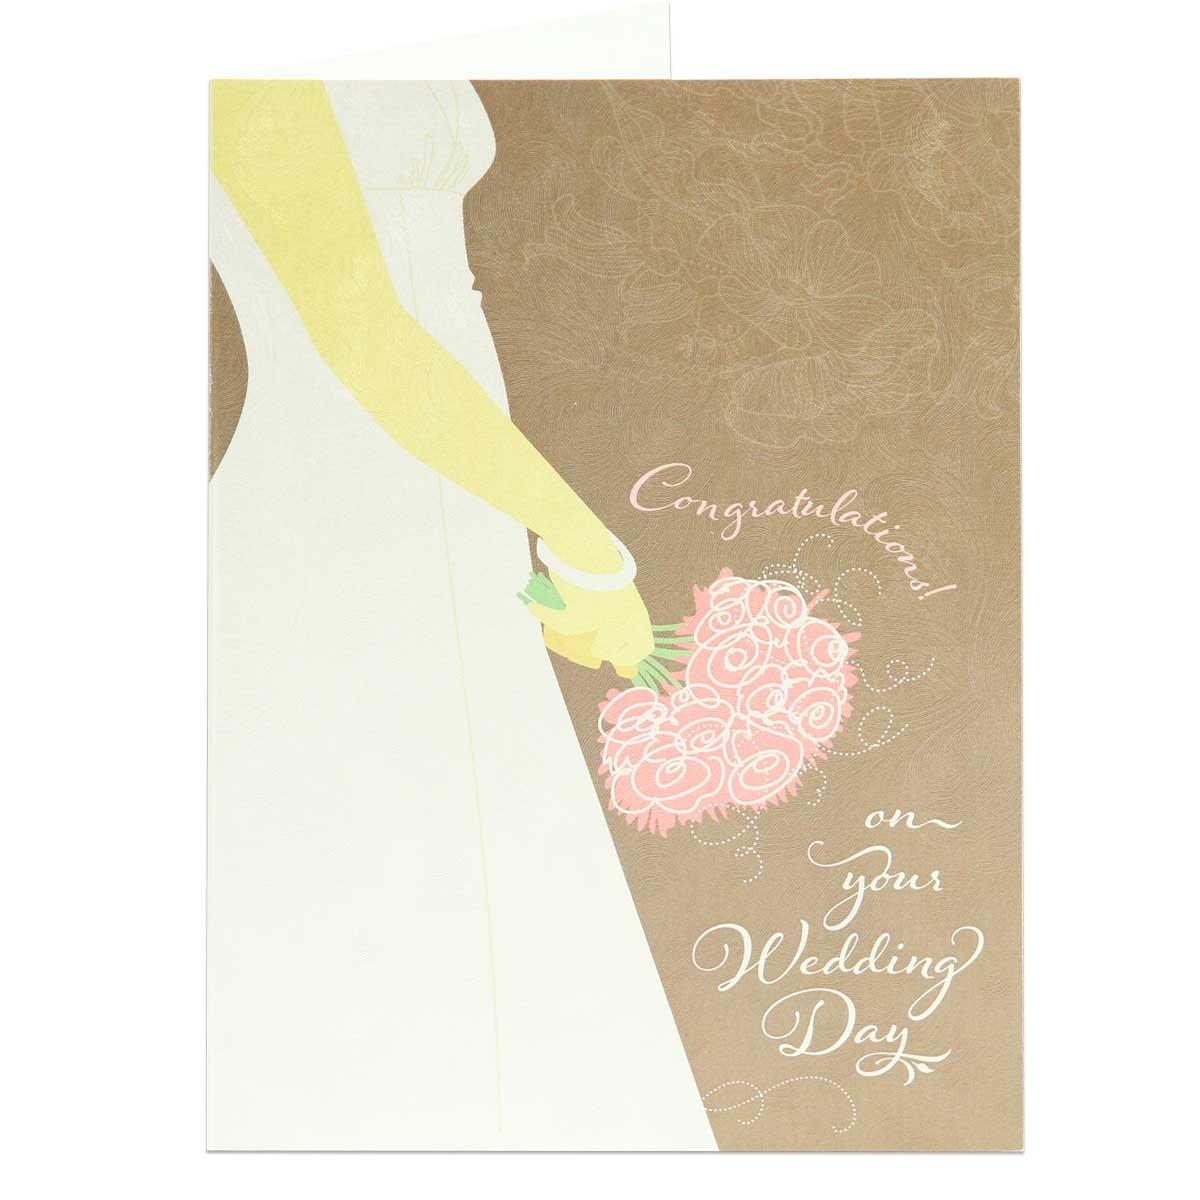 I Love You Pack Assorted Weddinganniversary Greeting Cards